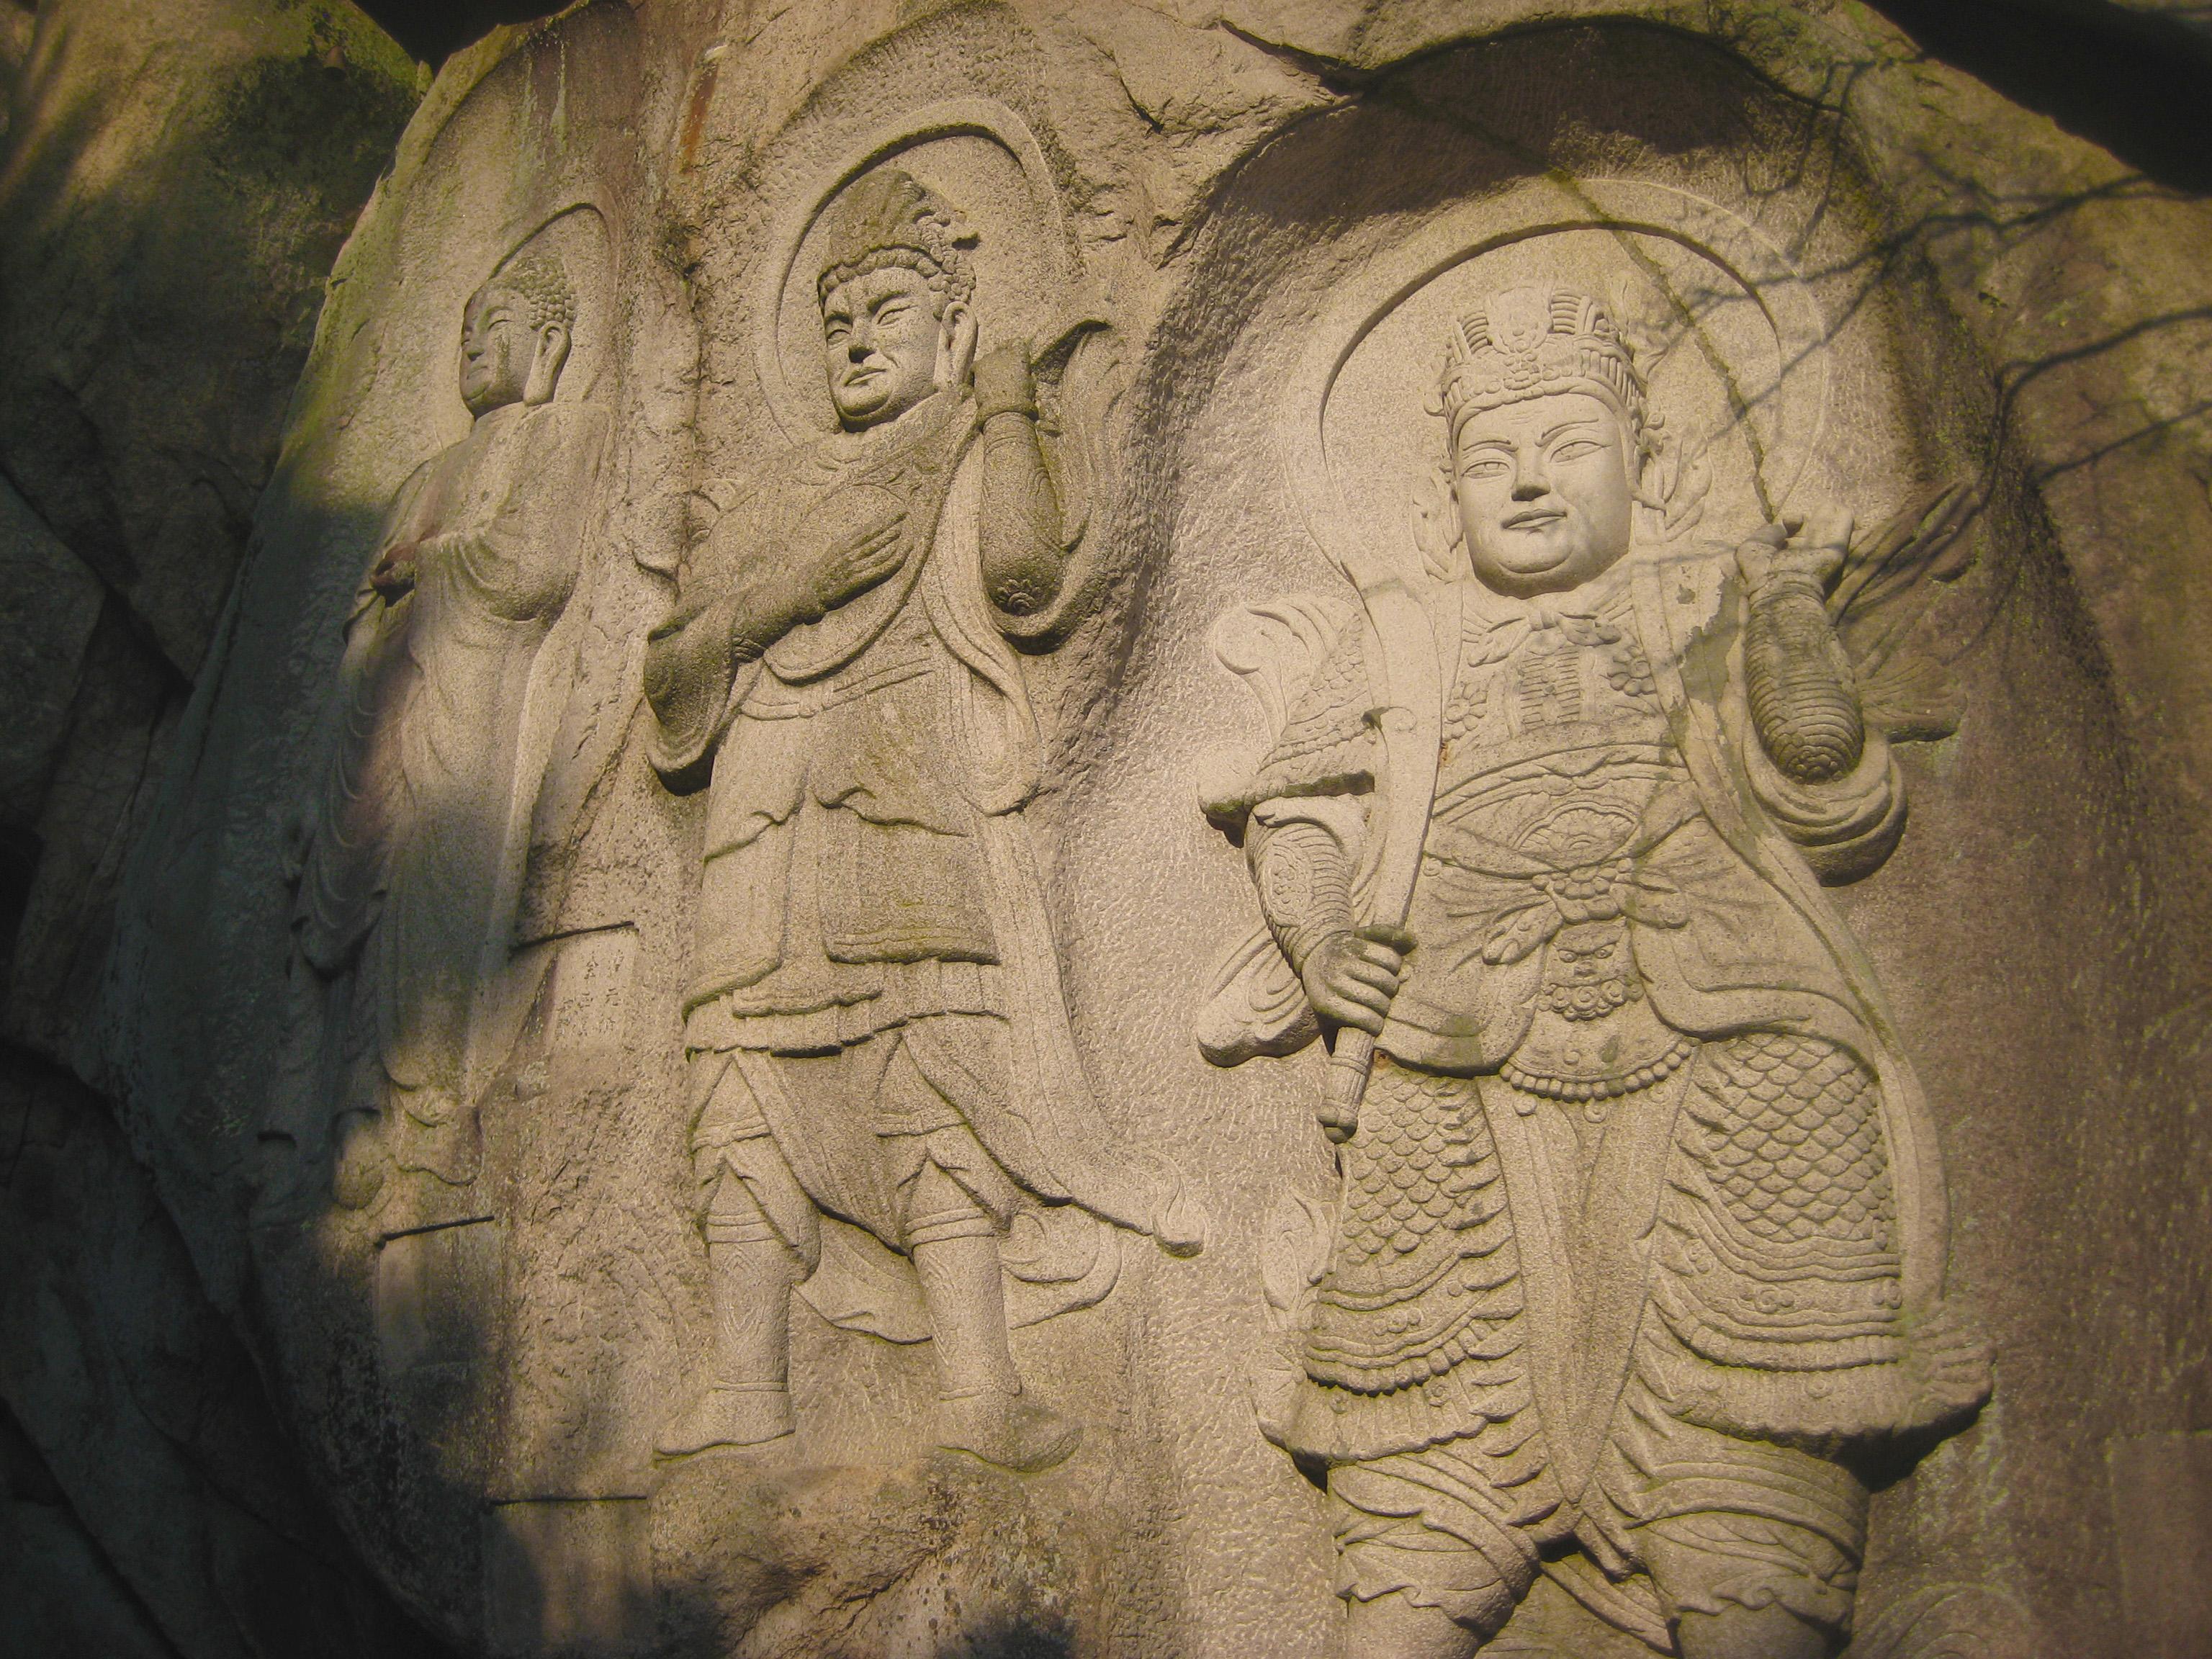 Seokbulsa Stone Guards